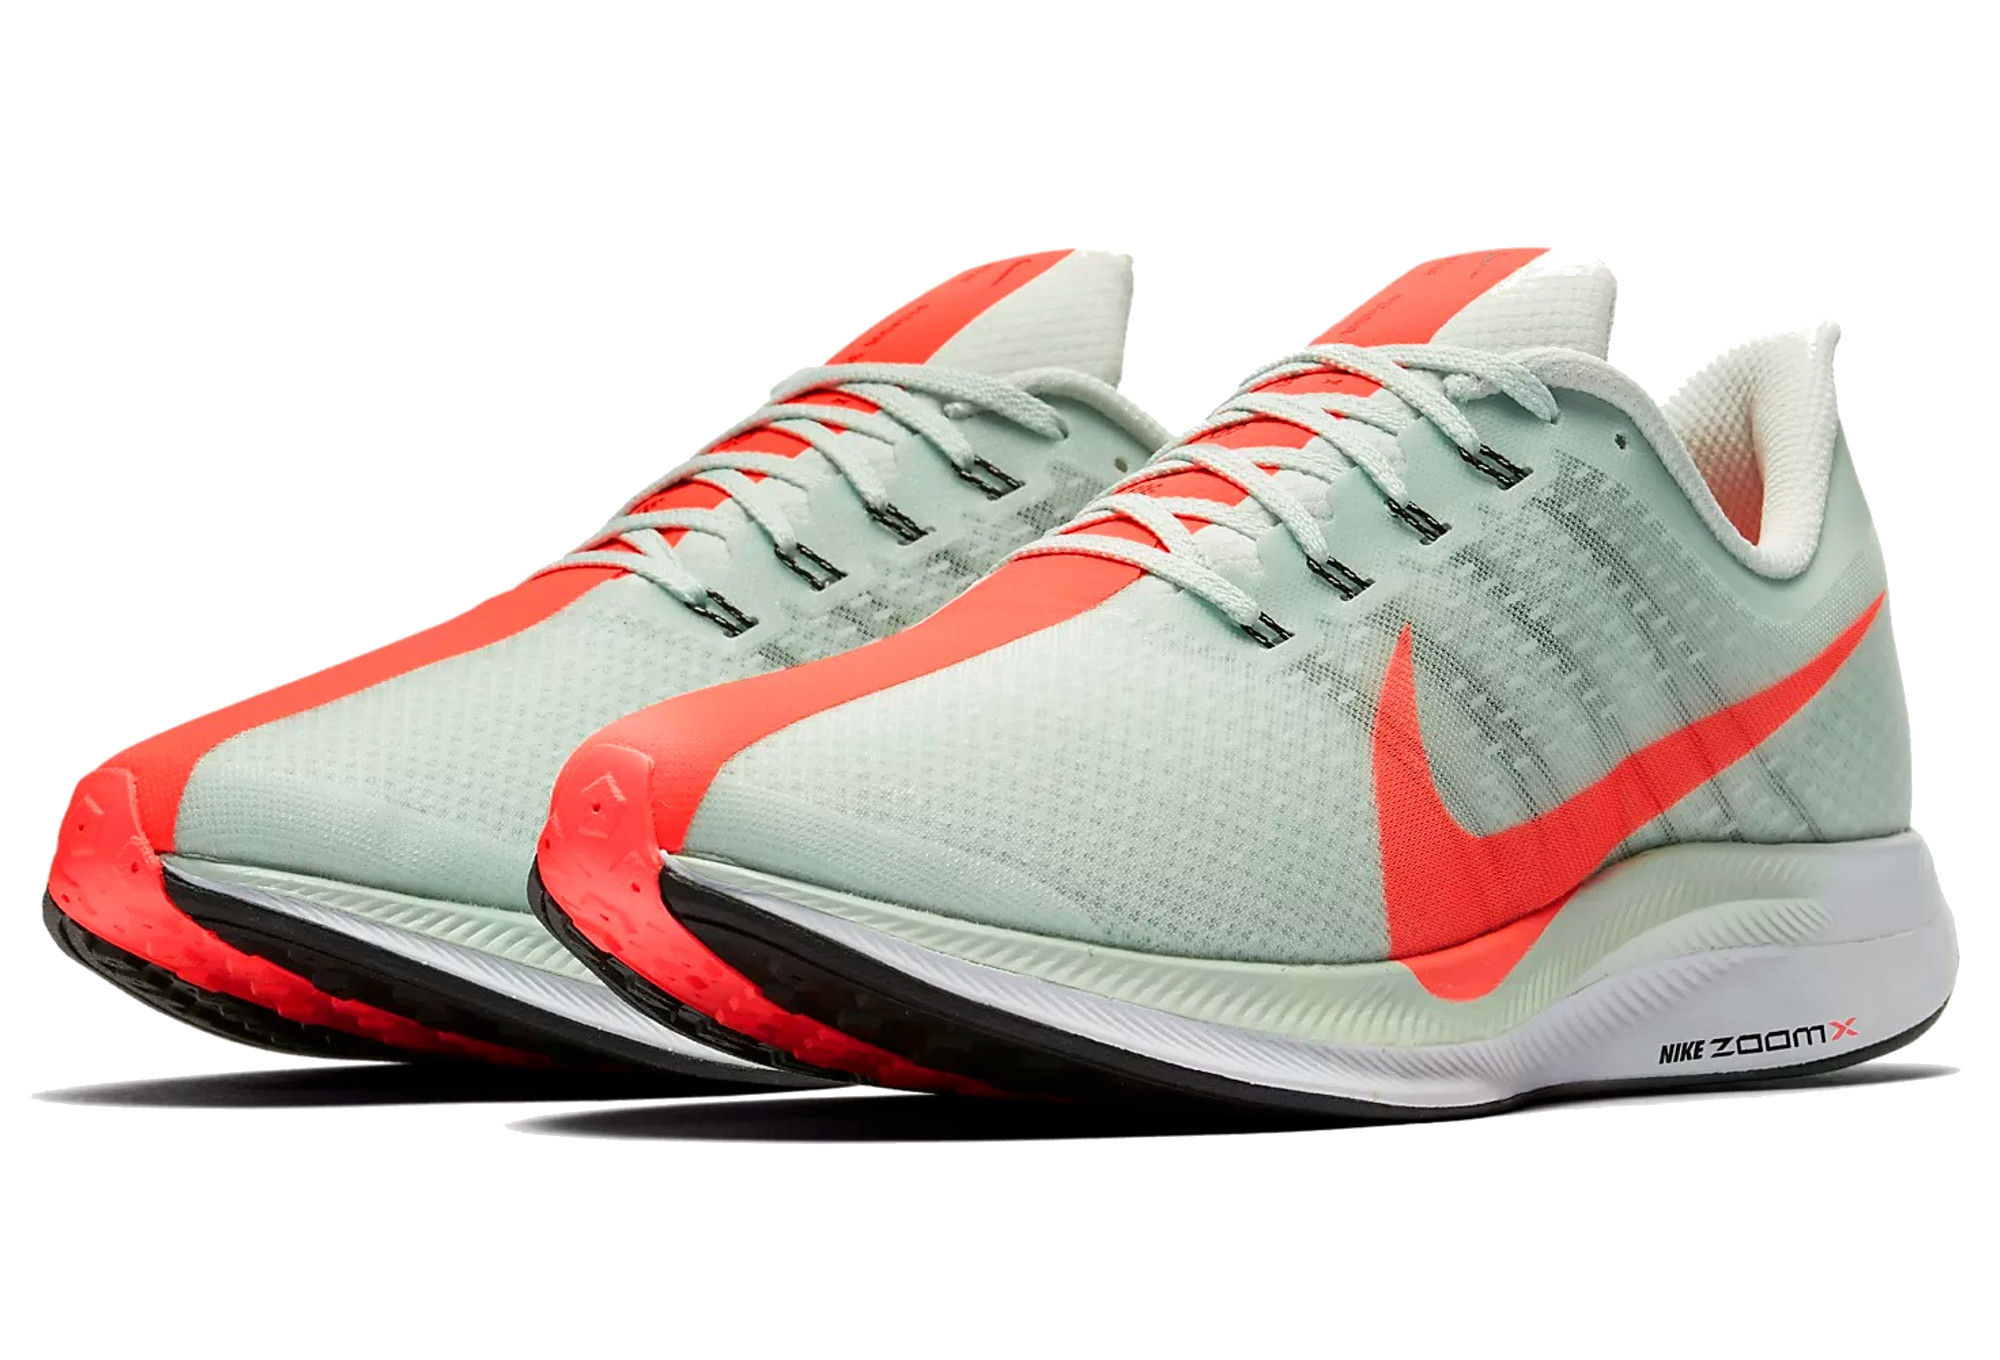 Nike Shox Sparkle Grey Nike Shox Sparkle Grey Background  5b369f7ea